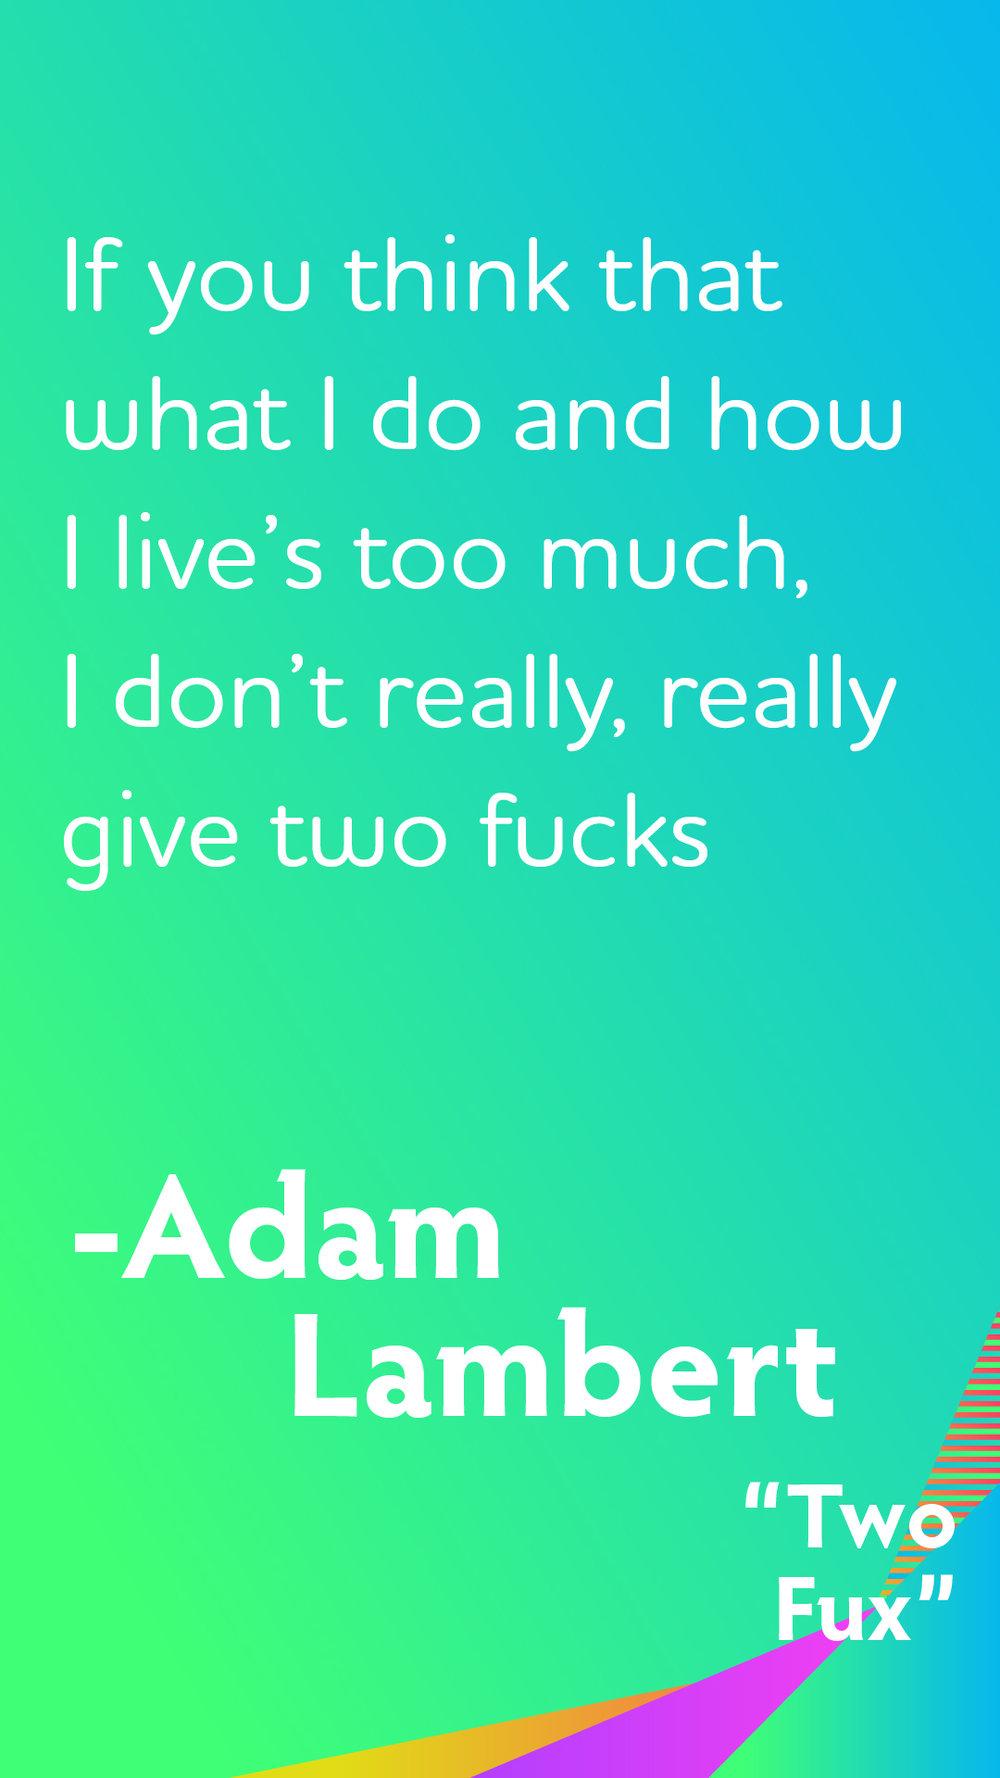 Pride2018_IGStory_Lyrics-06.jpg